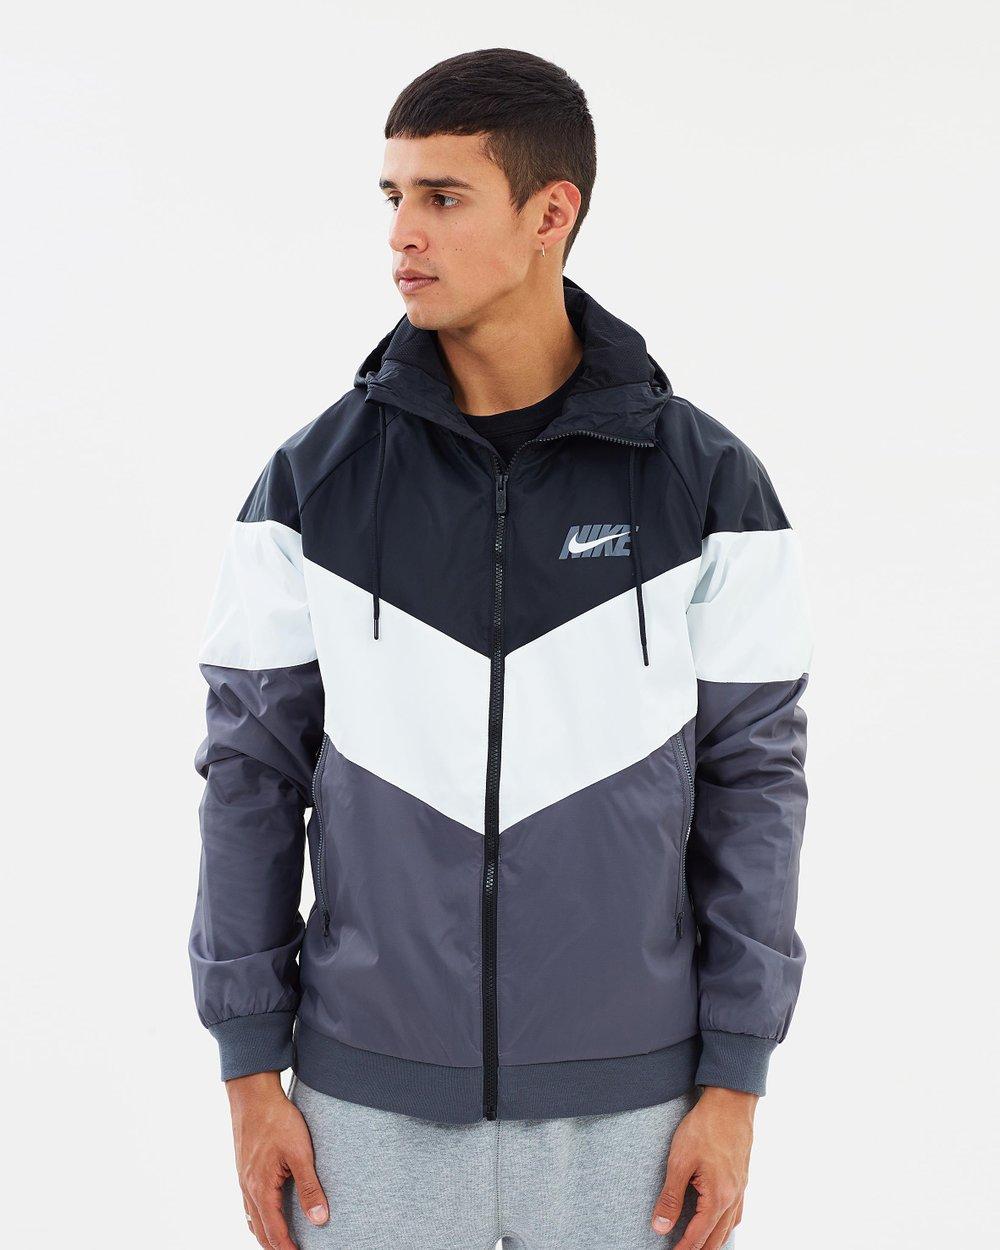 f4b9178b7 Sportswear Windrunner Jacket by Nike Online | THE ICONIC | Australia